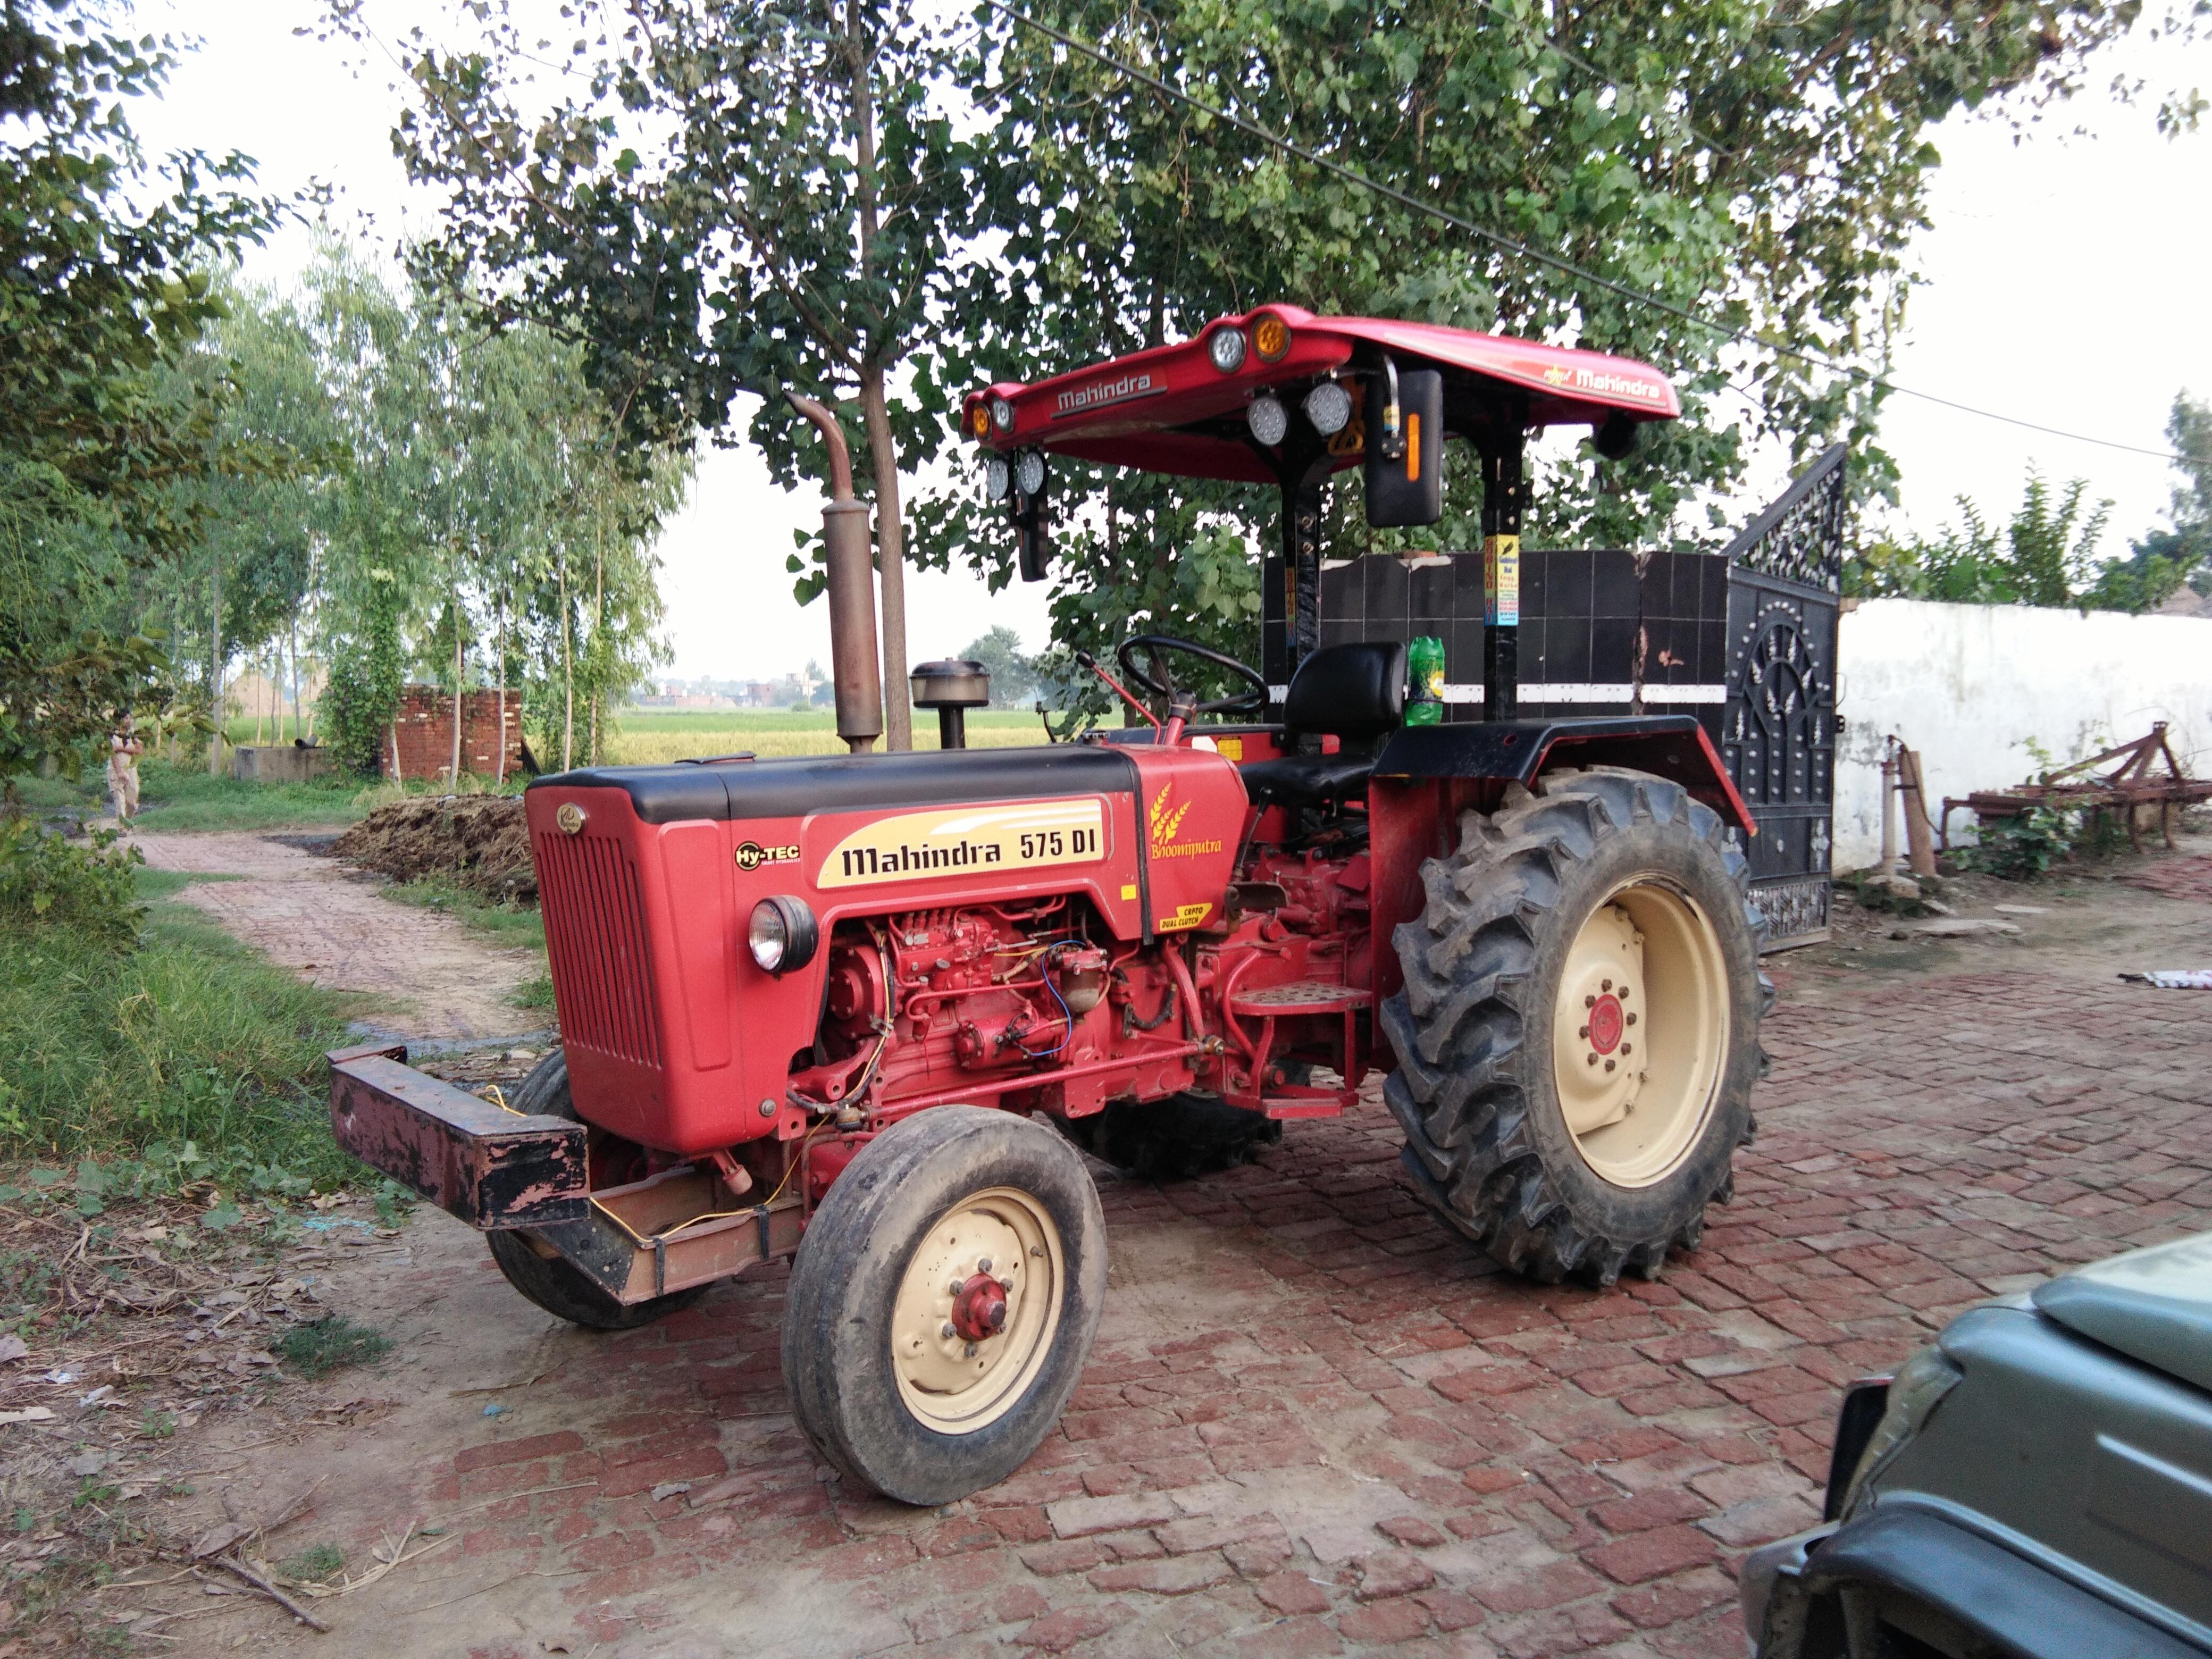 Mahindra Tractor Chattri